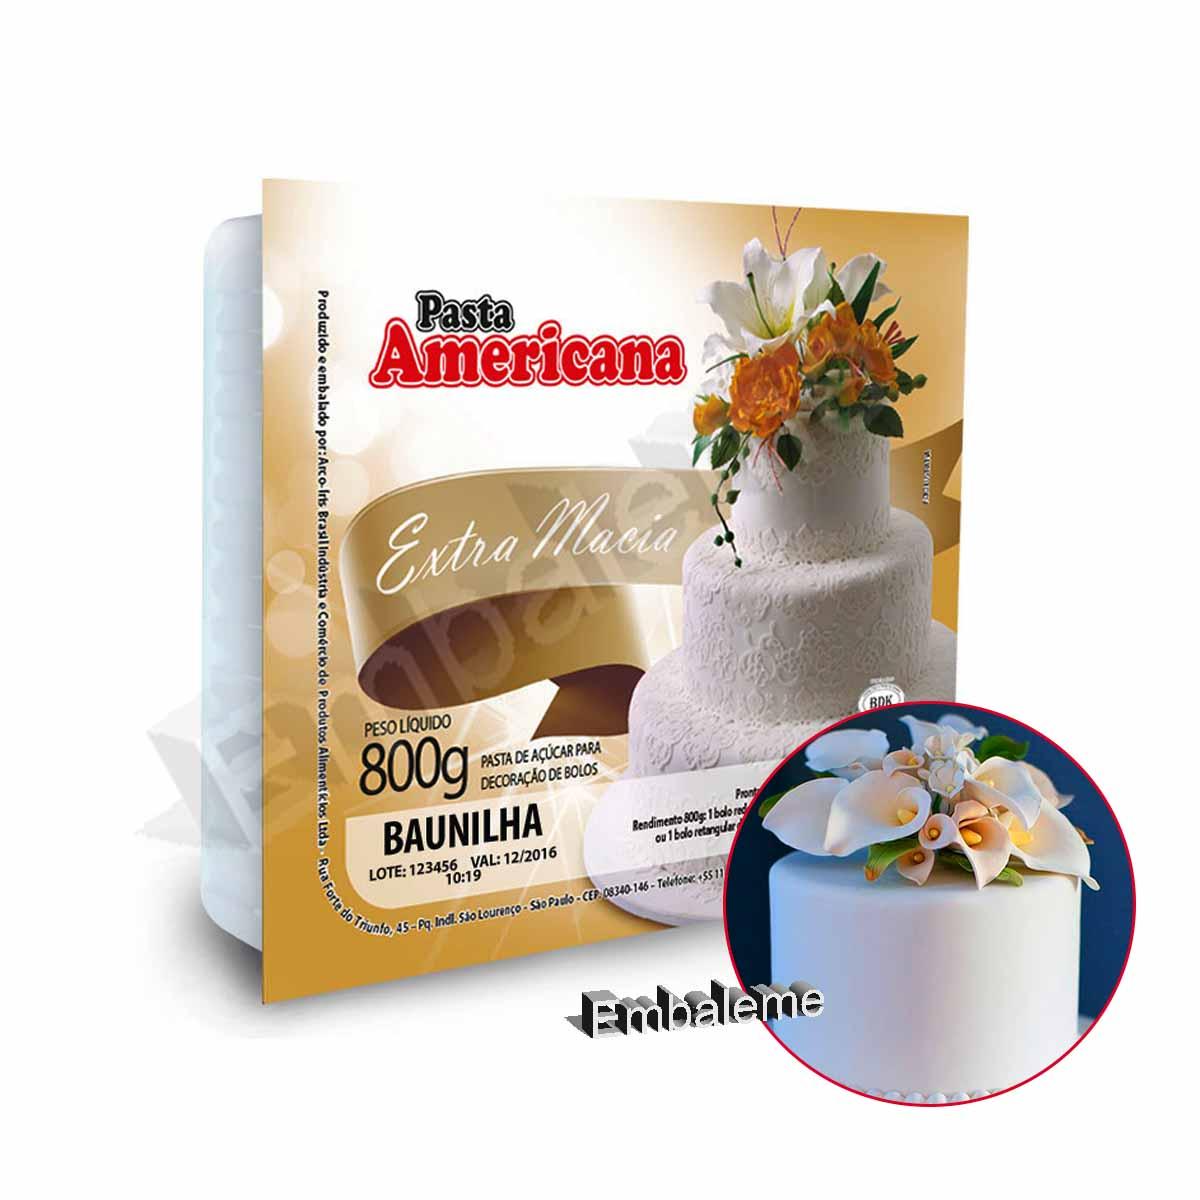 Pasta Americana Sabor Baunilha 800g Arcolor